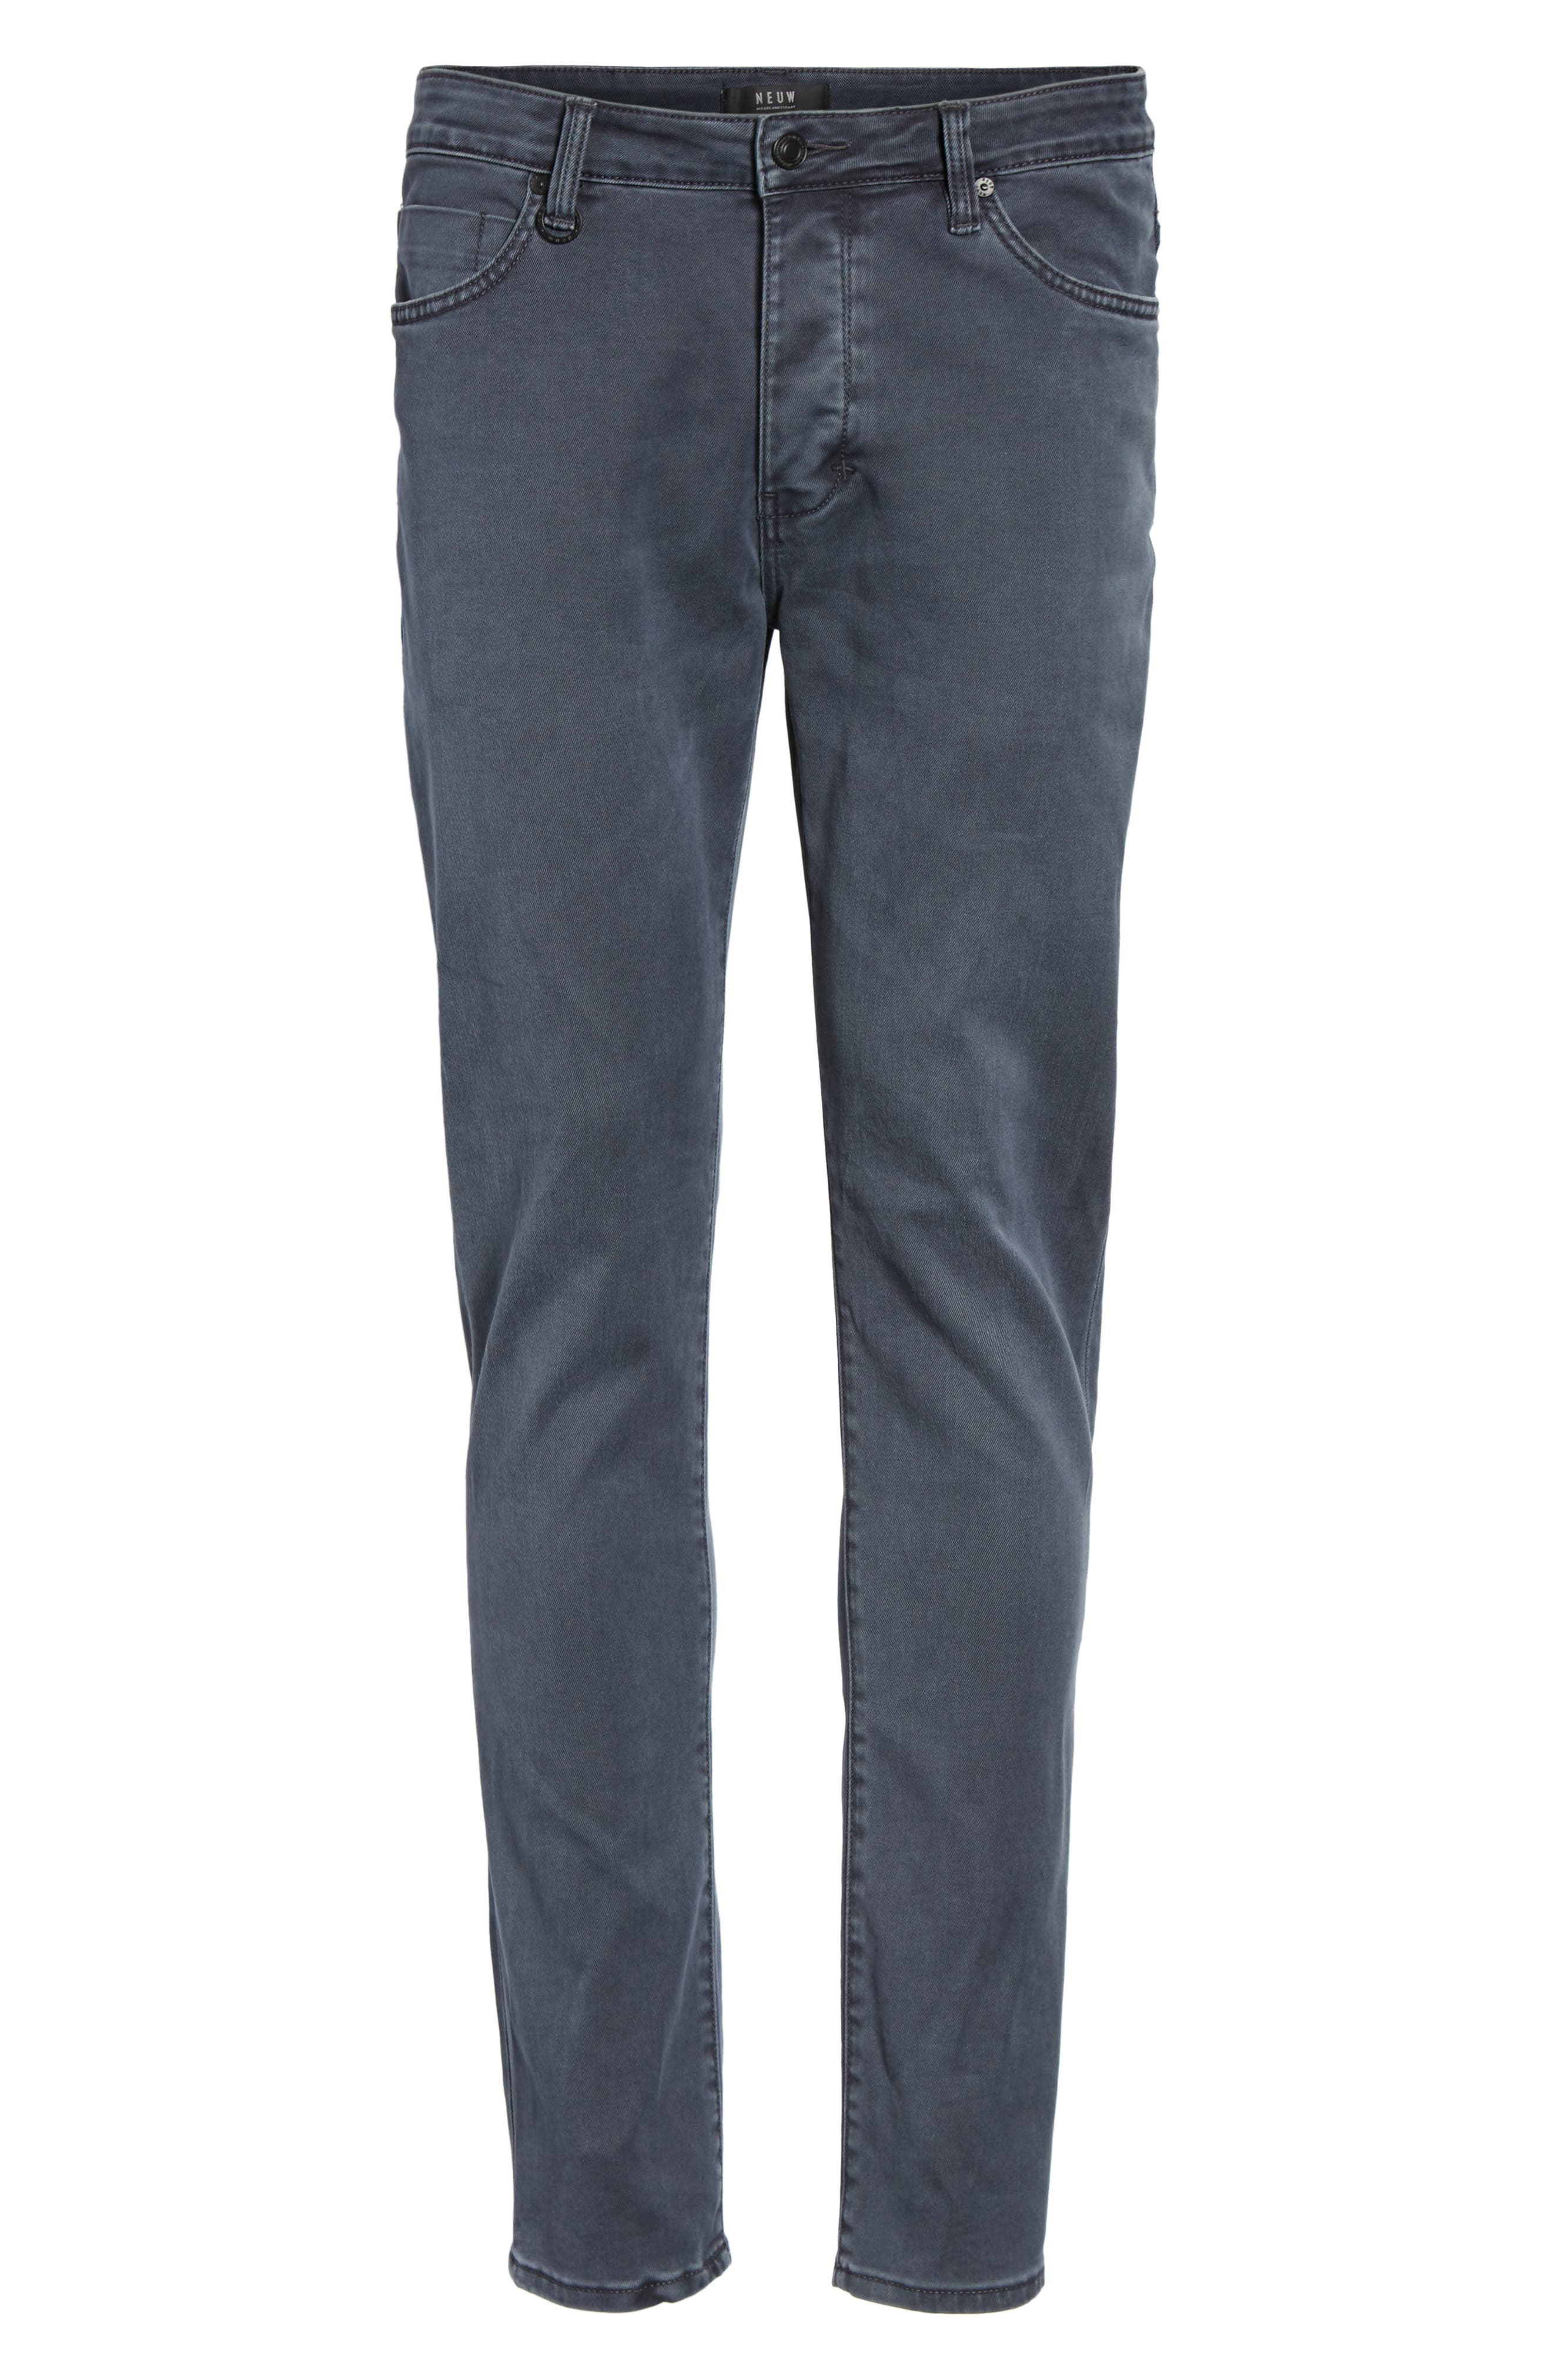 Lou Slim Fit Jeans,                             Alternate thumbnail 6, color,                             LIBERTE